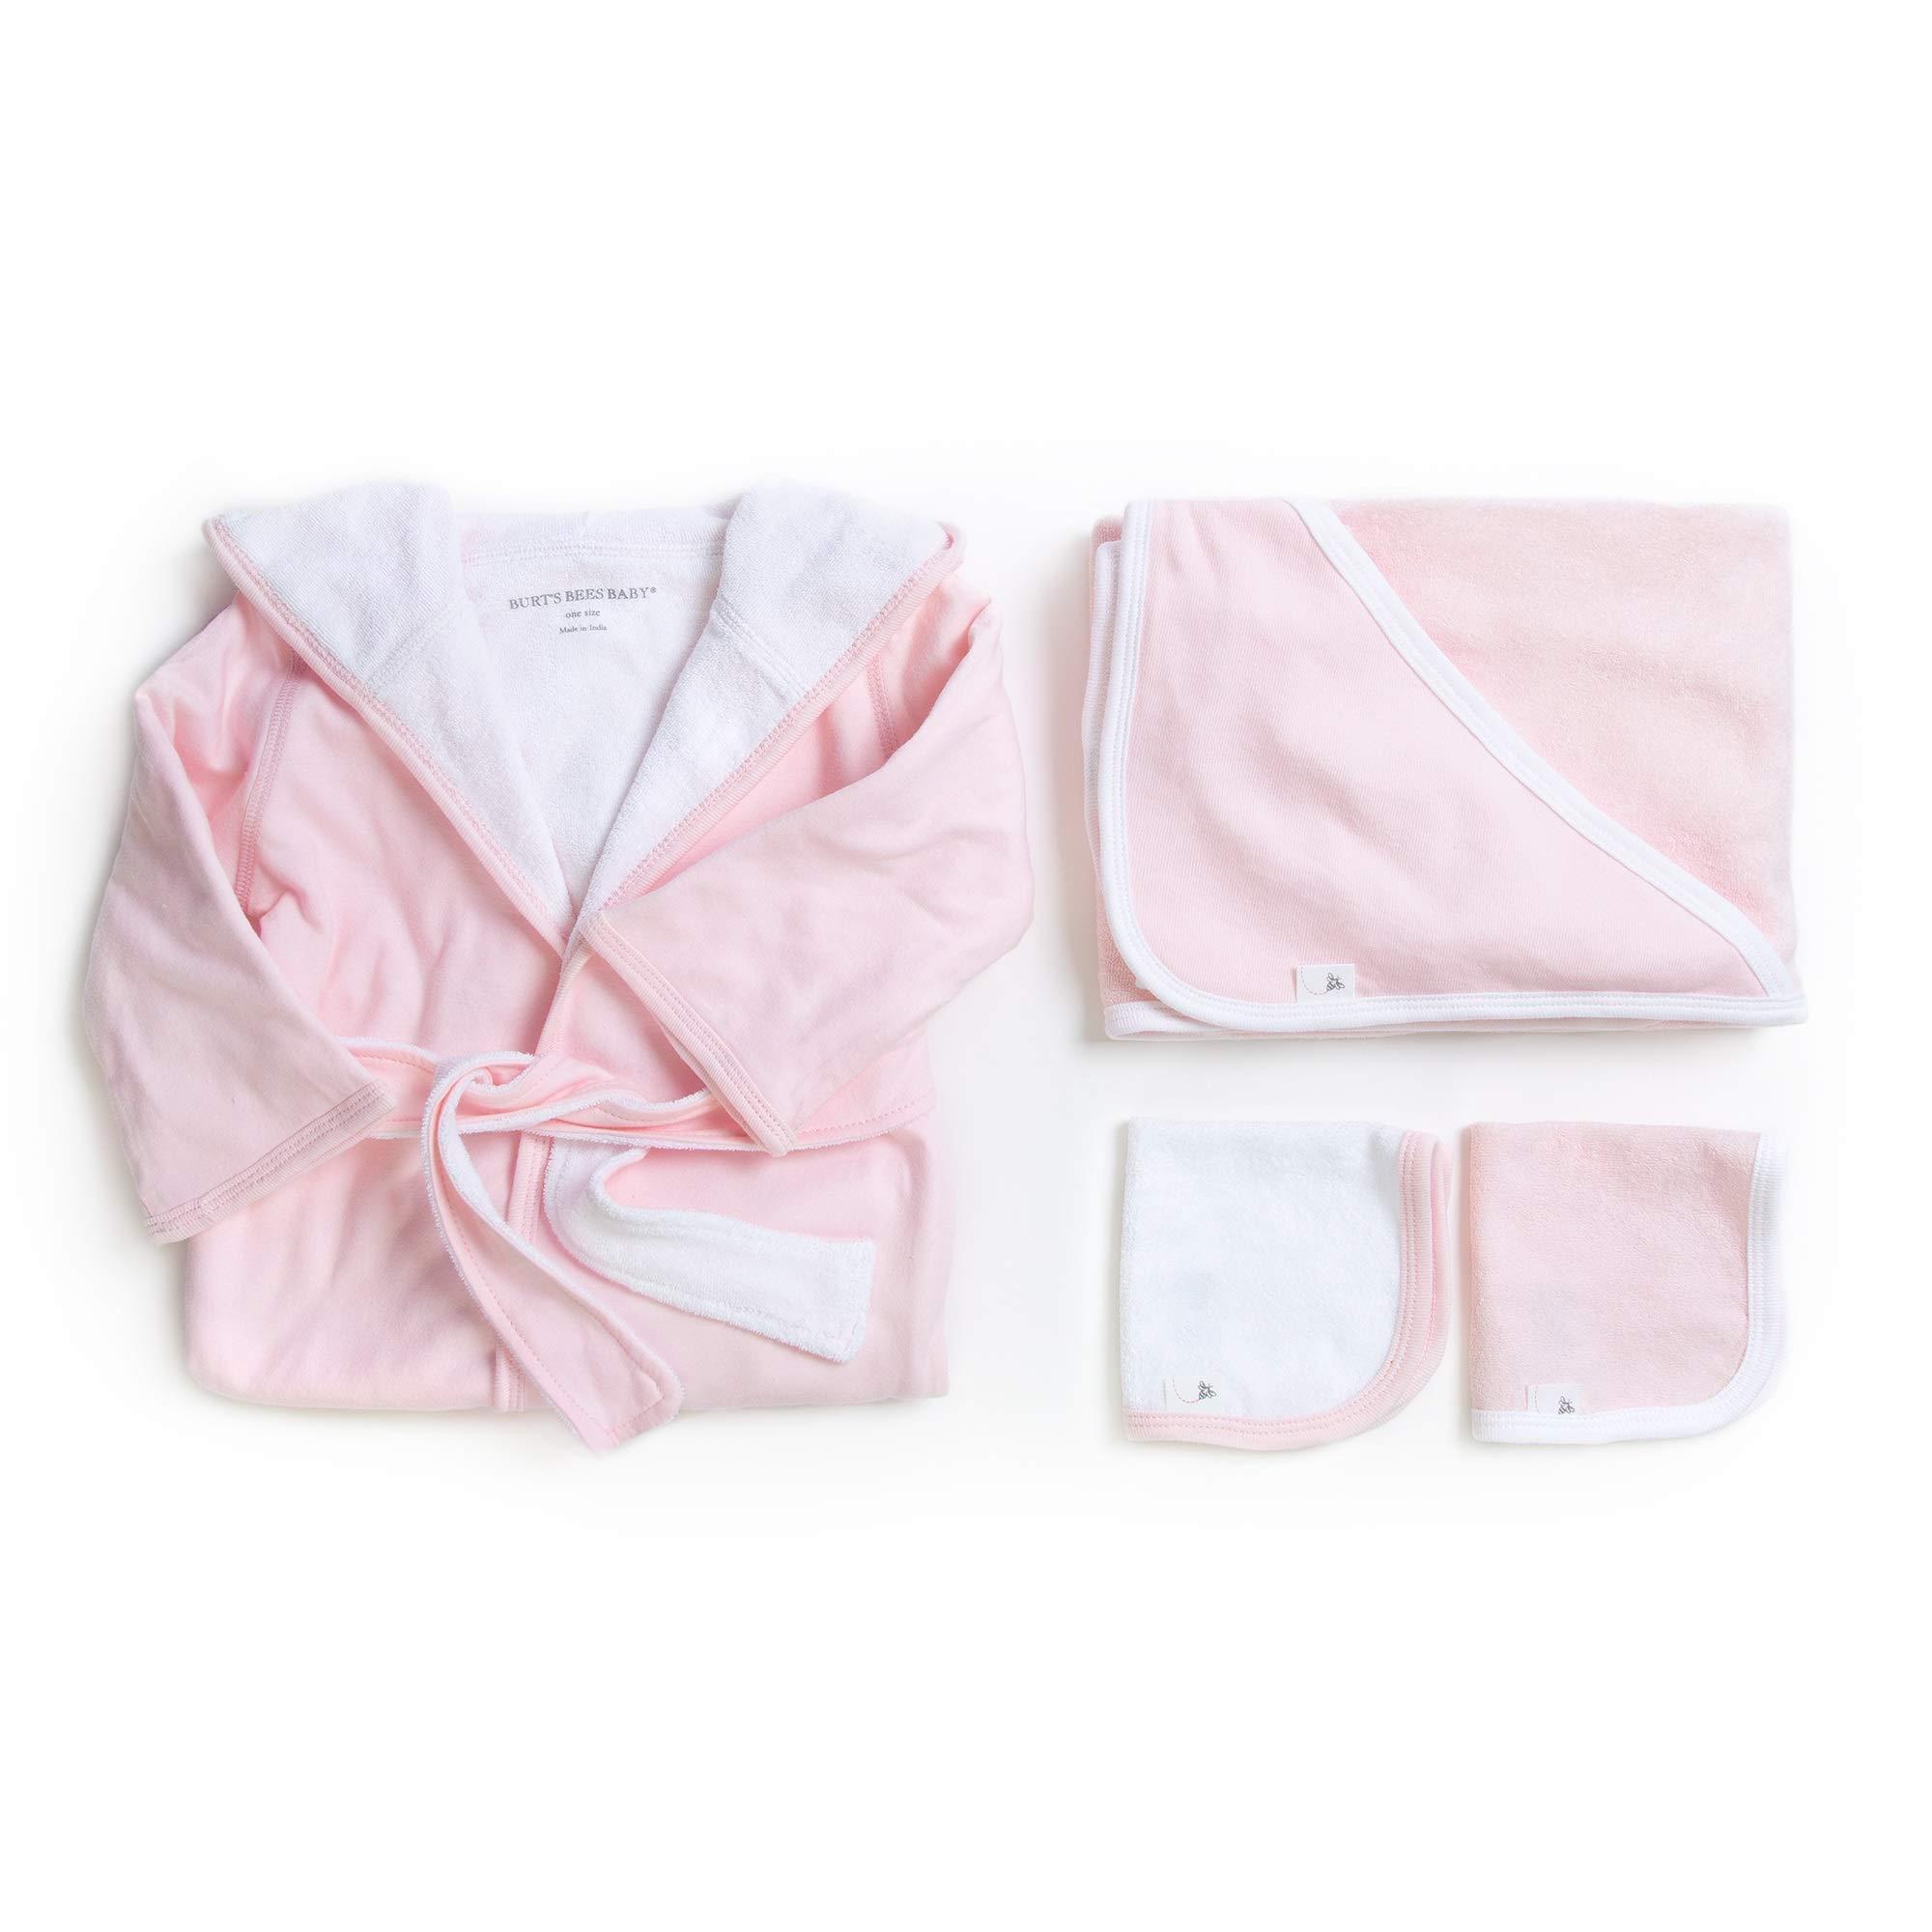 Burt's Bees Baby - Bathtime Gift Bundle - Includes Bathrobe, Hooded Towel & Washcloths, 100% Organic Cotton (Blossom Pink)